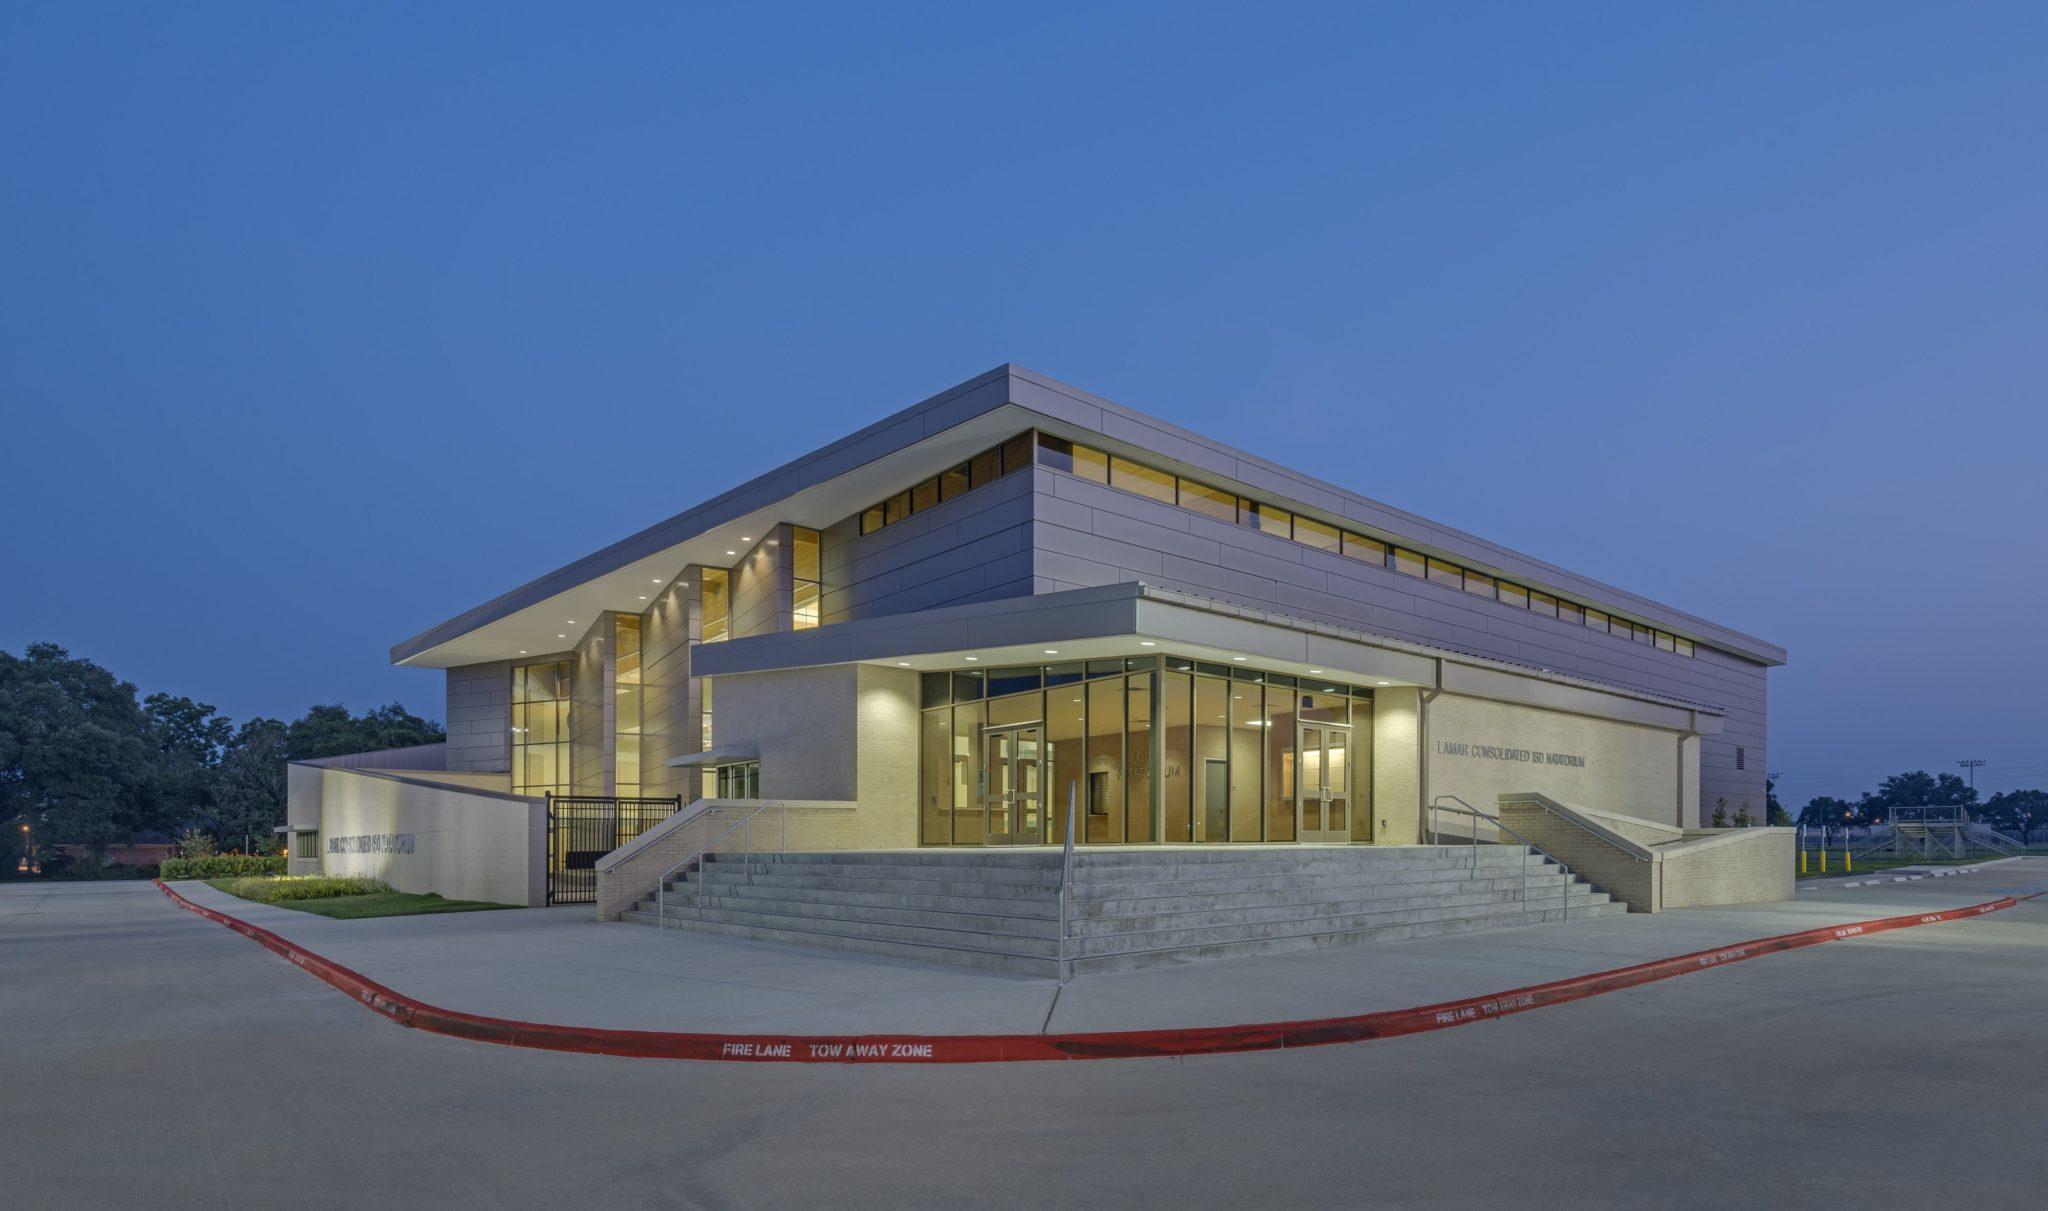 Texas Style High School Pools